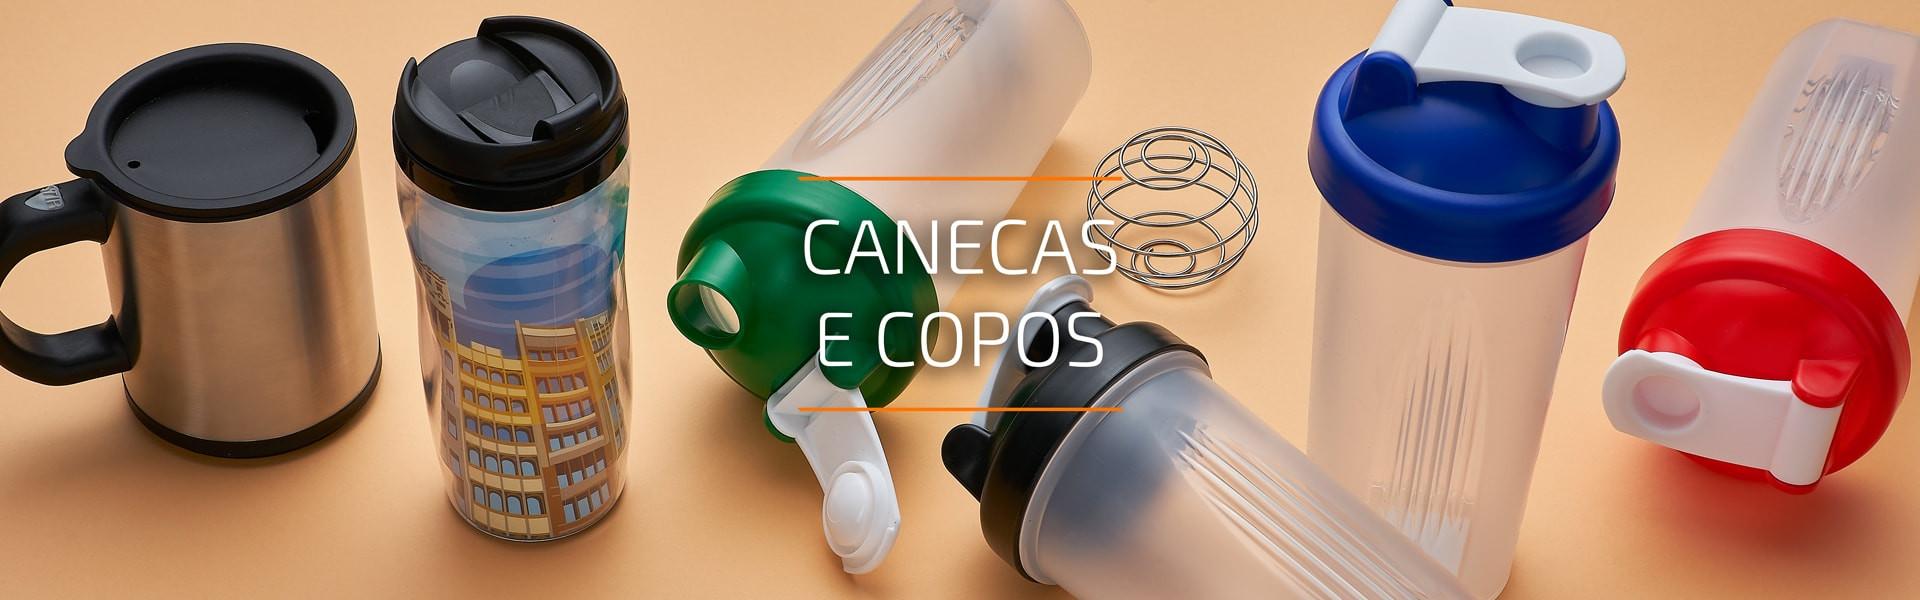 banner_CANECAS_COPOS-min.jpg